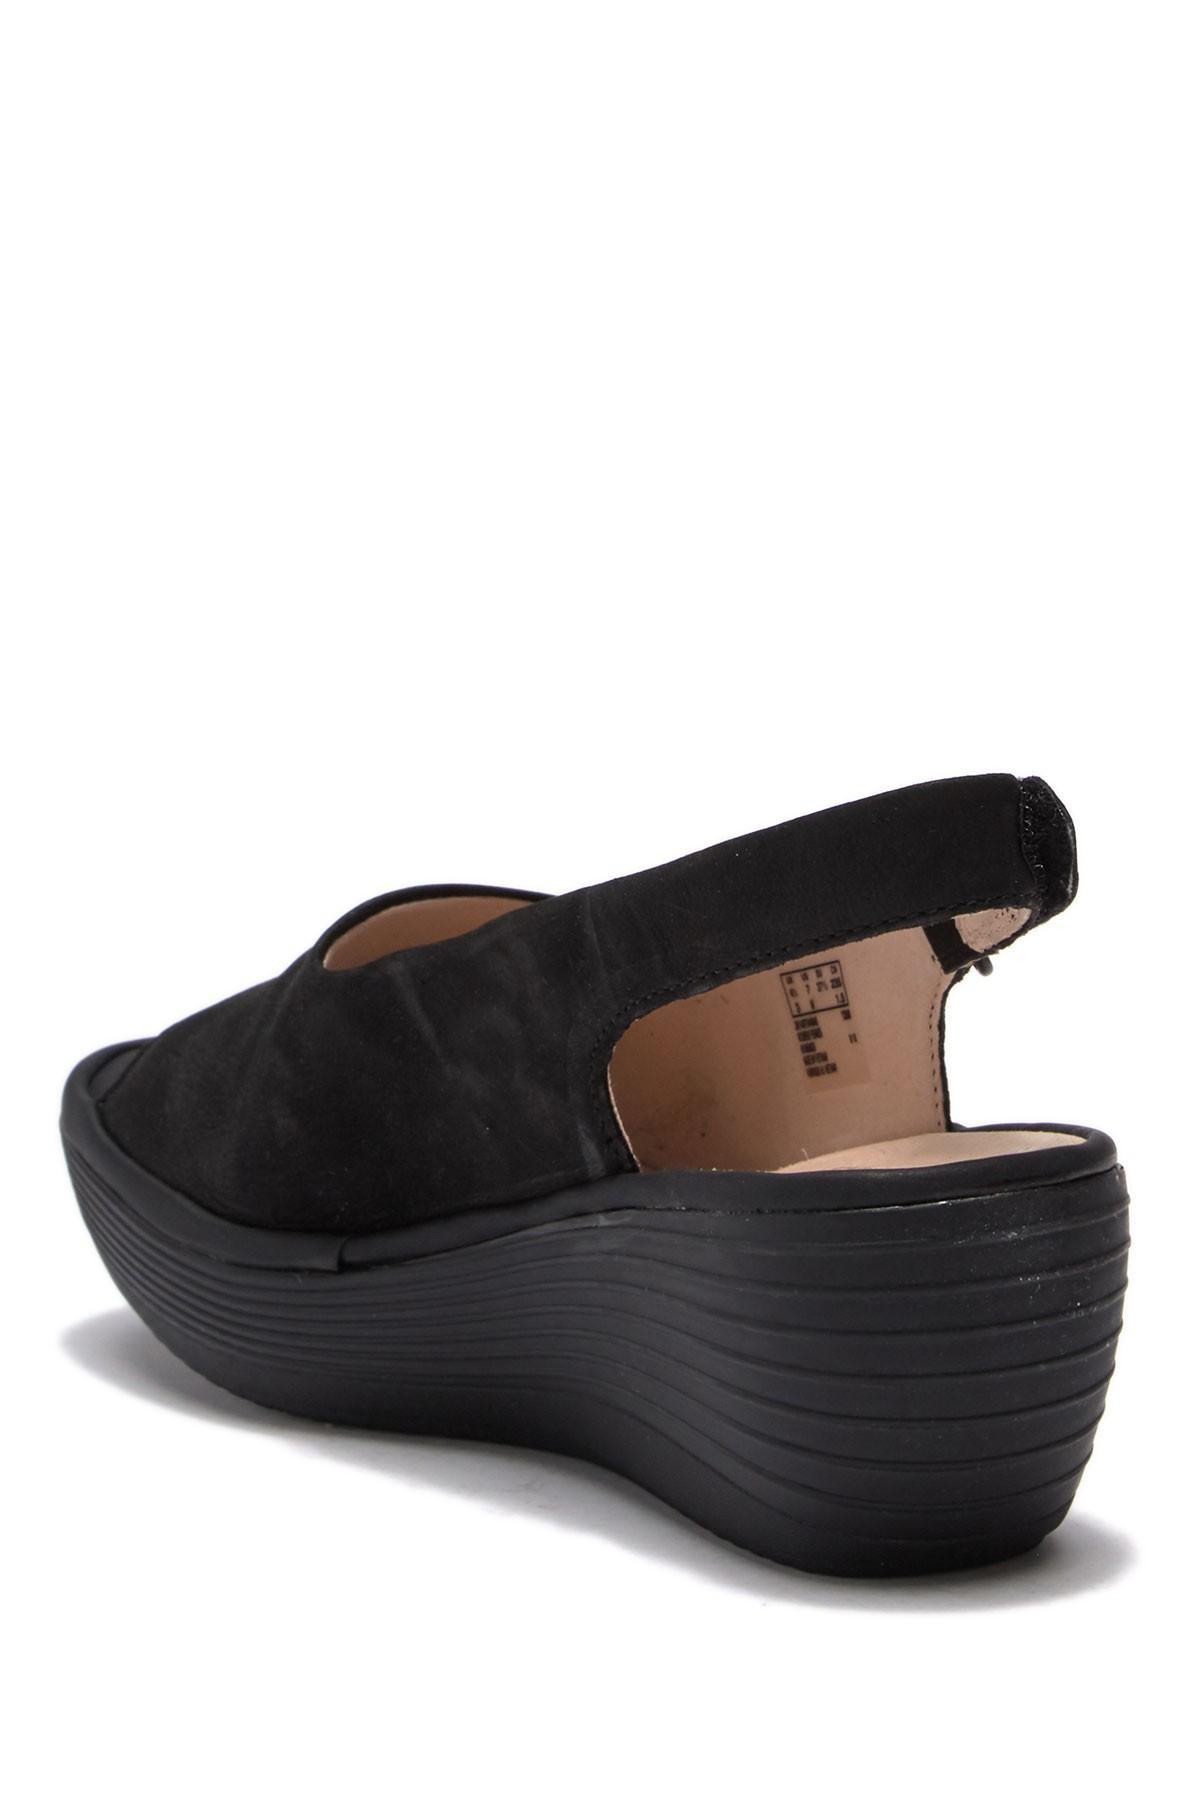 3128181fe95 Clarks - Black Reedly Shania Wedge Sandals - Lyst. View fullscreen